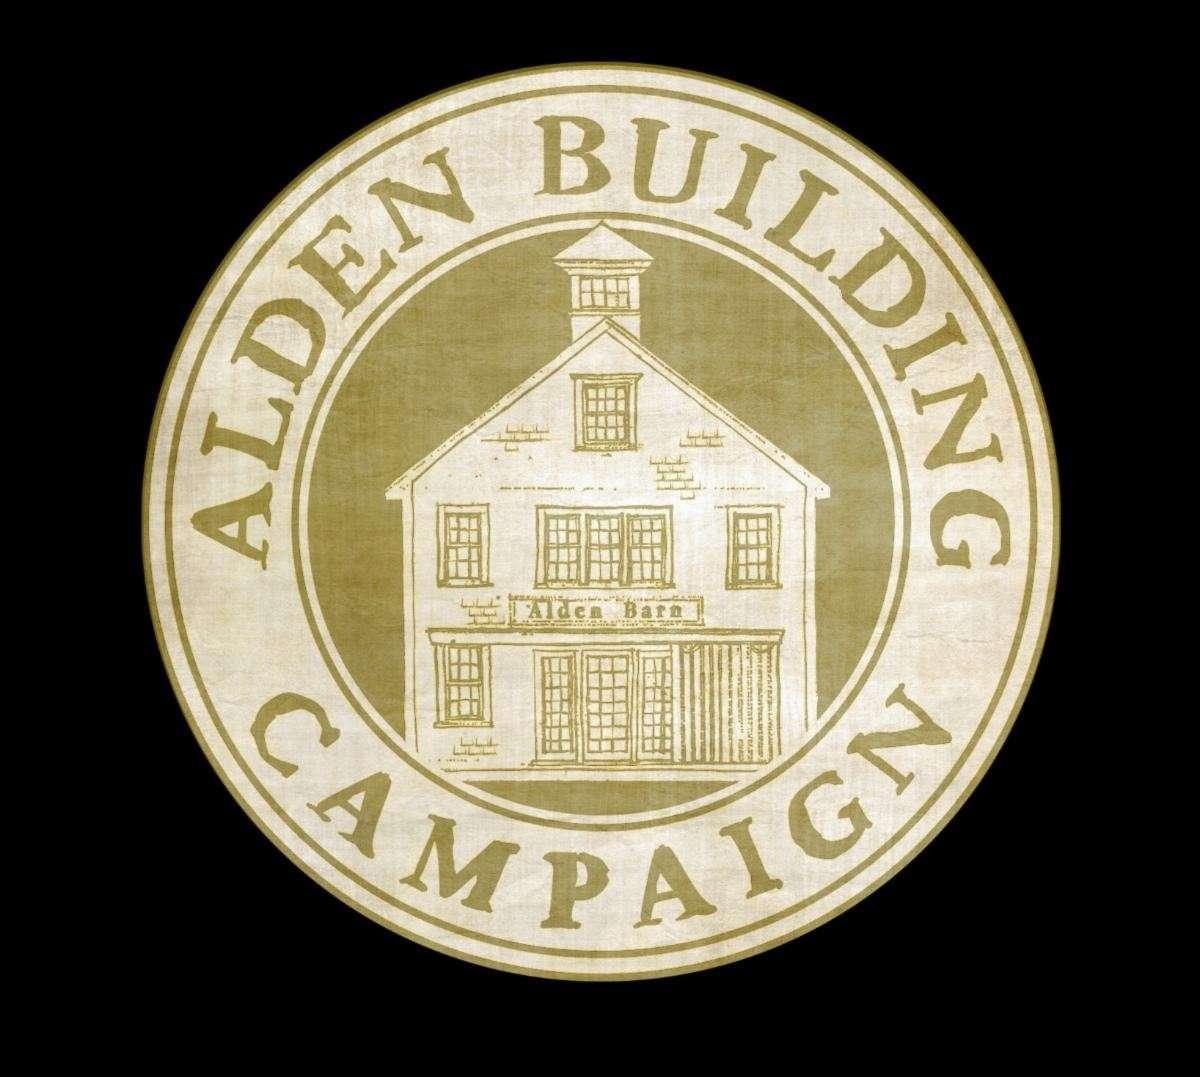 Alden House event